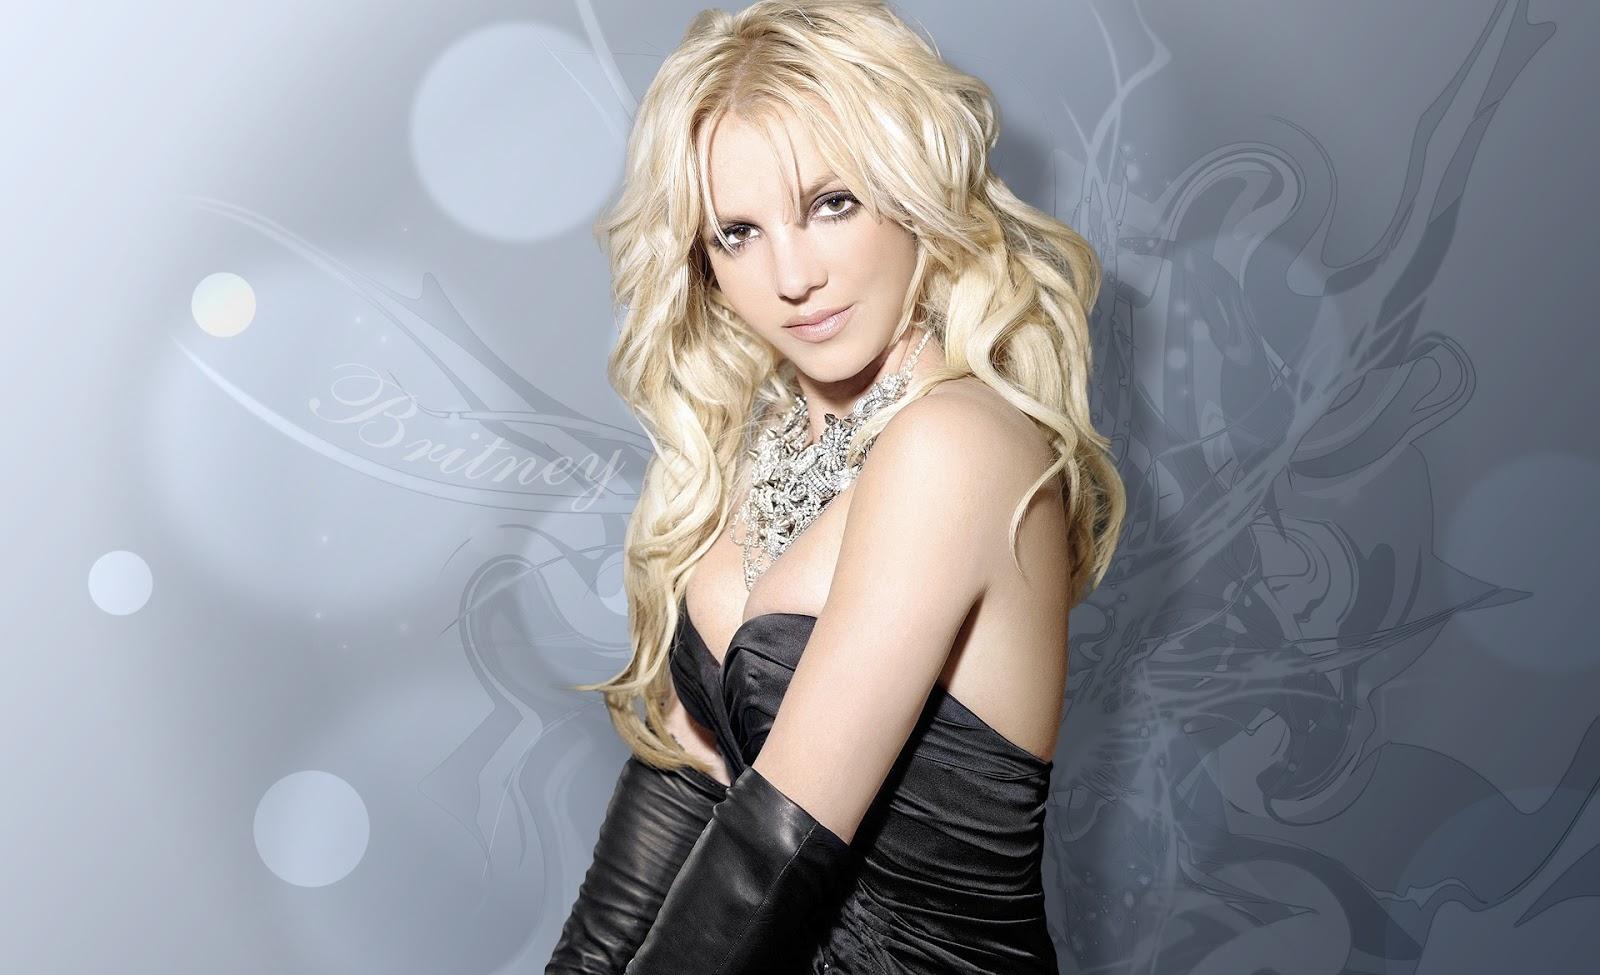 Britney Spears New HD Wallpaper 2013 | World Of HD Wallpapers